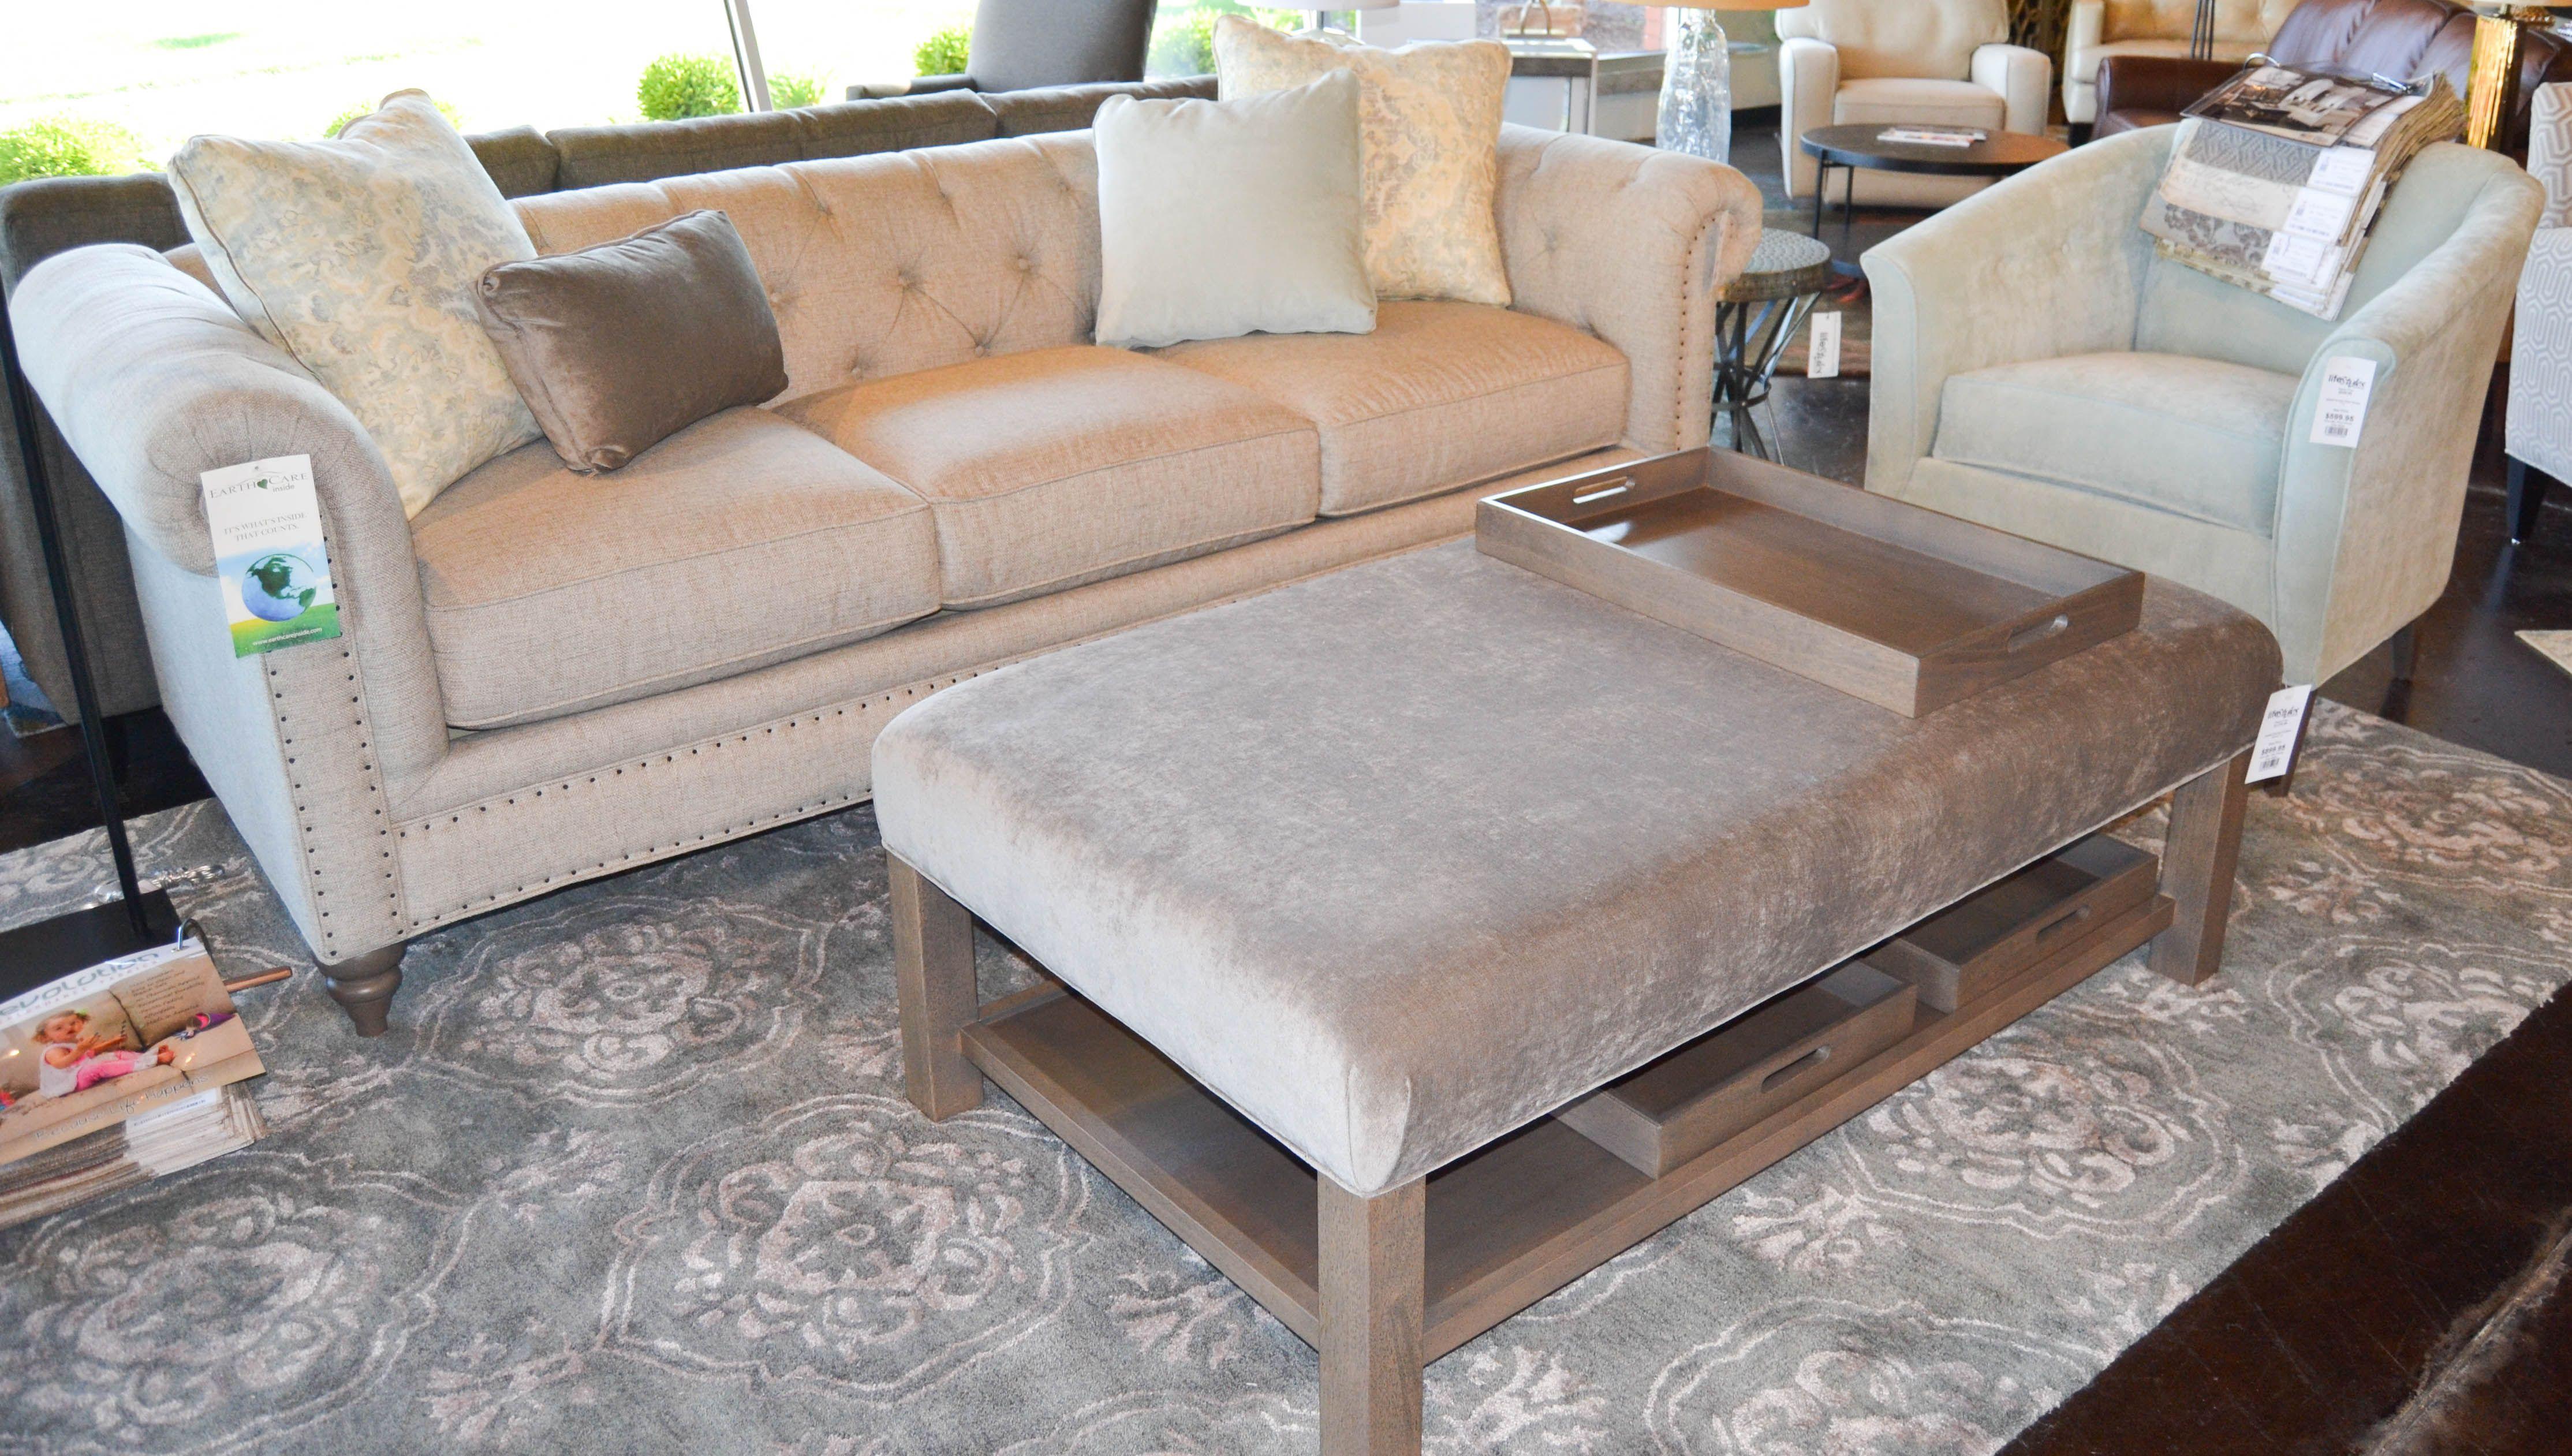 Ottoman With Shelf And Chesterfield Sofa Www Lifestylescomo Com